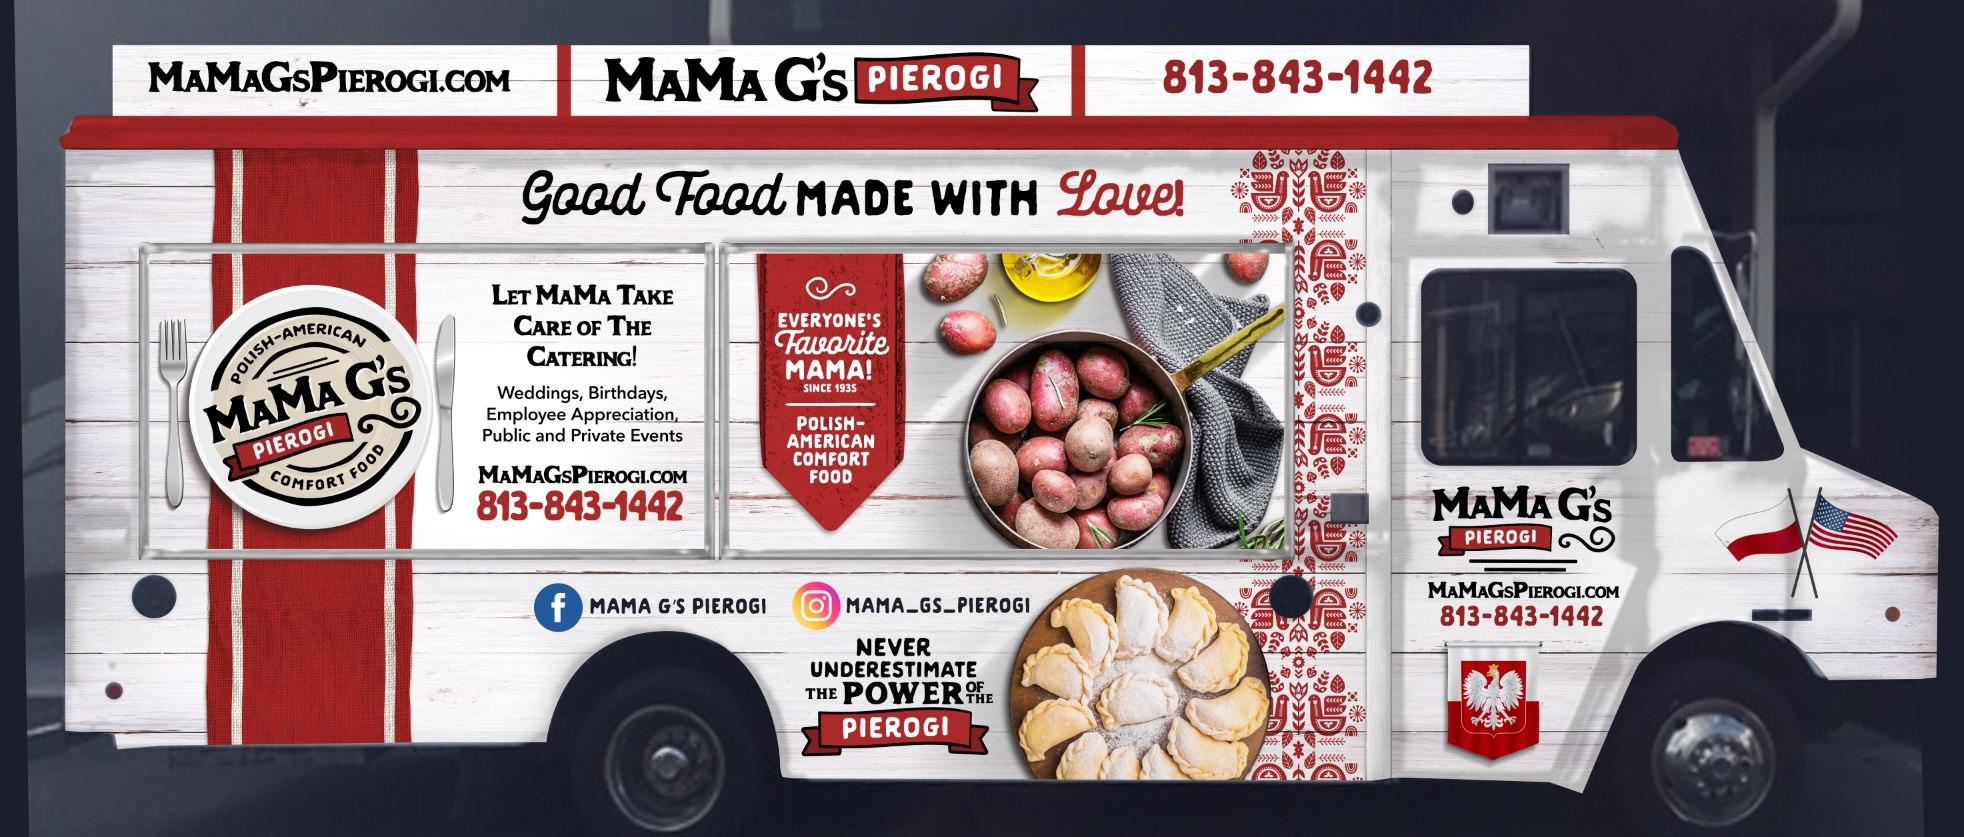 MaMa G's Pierogi Food Truck